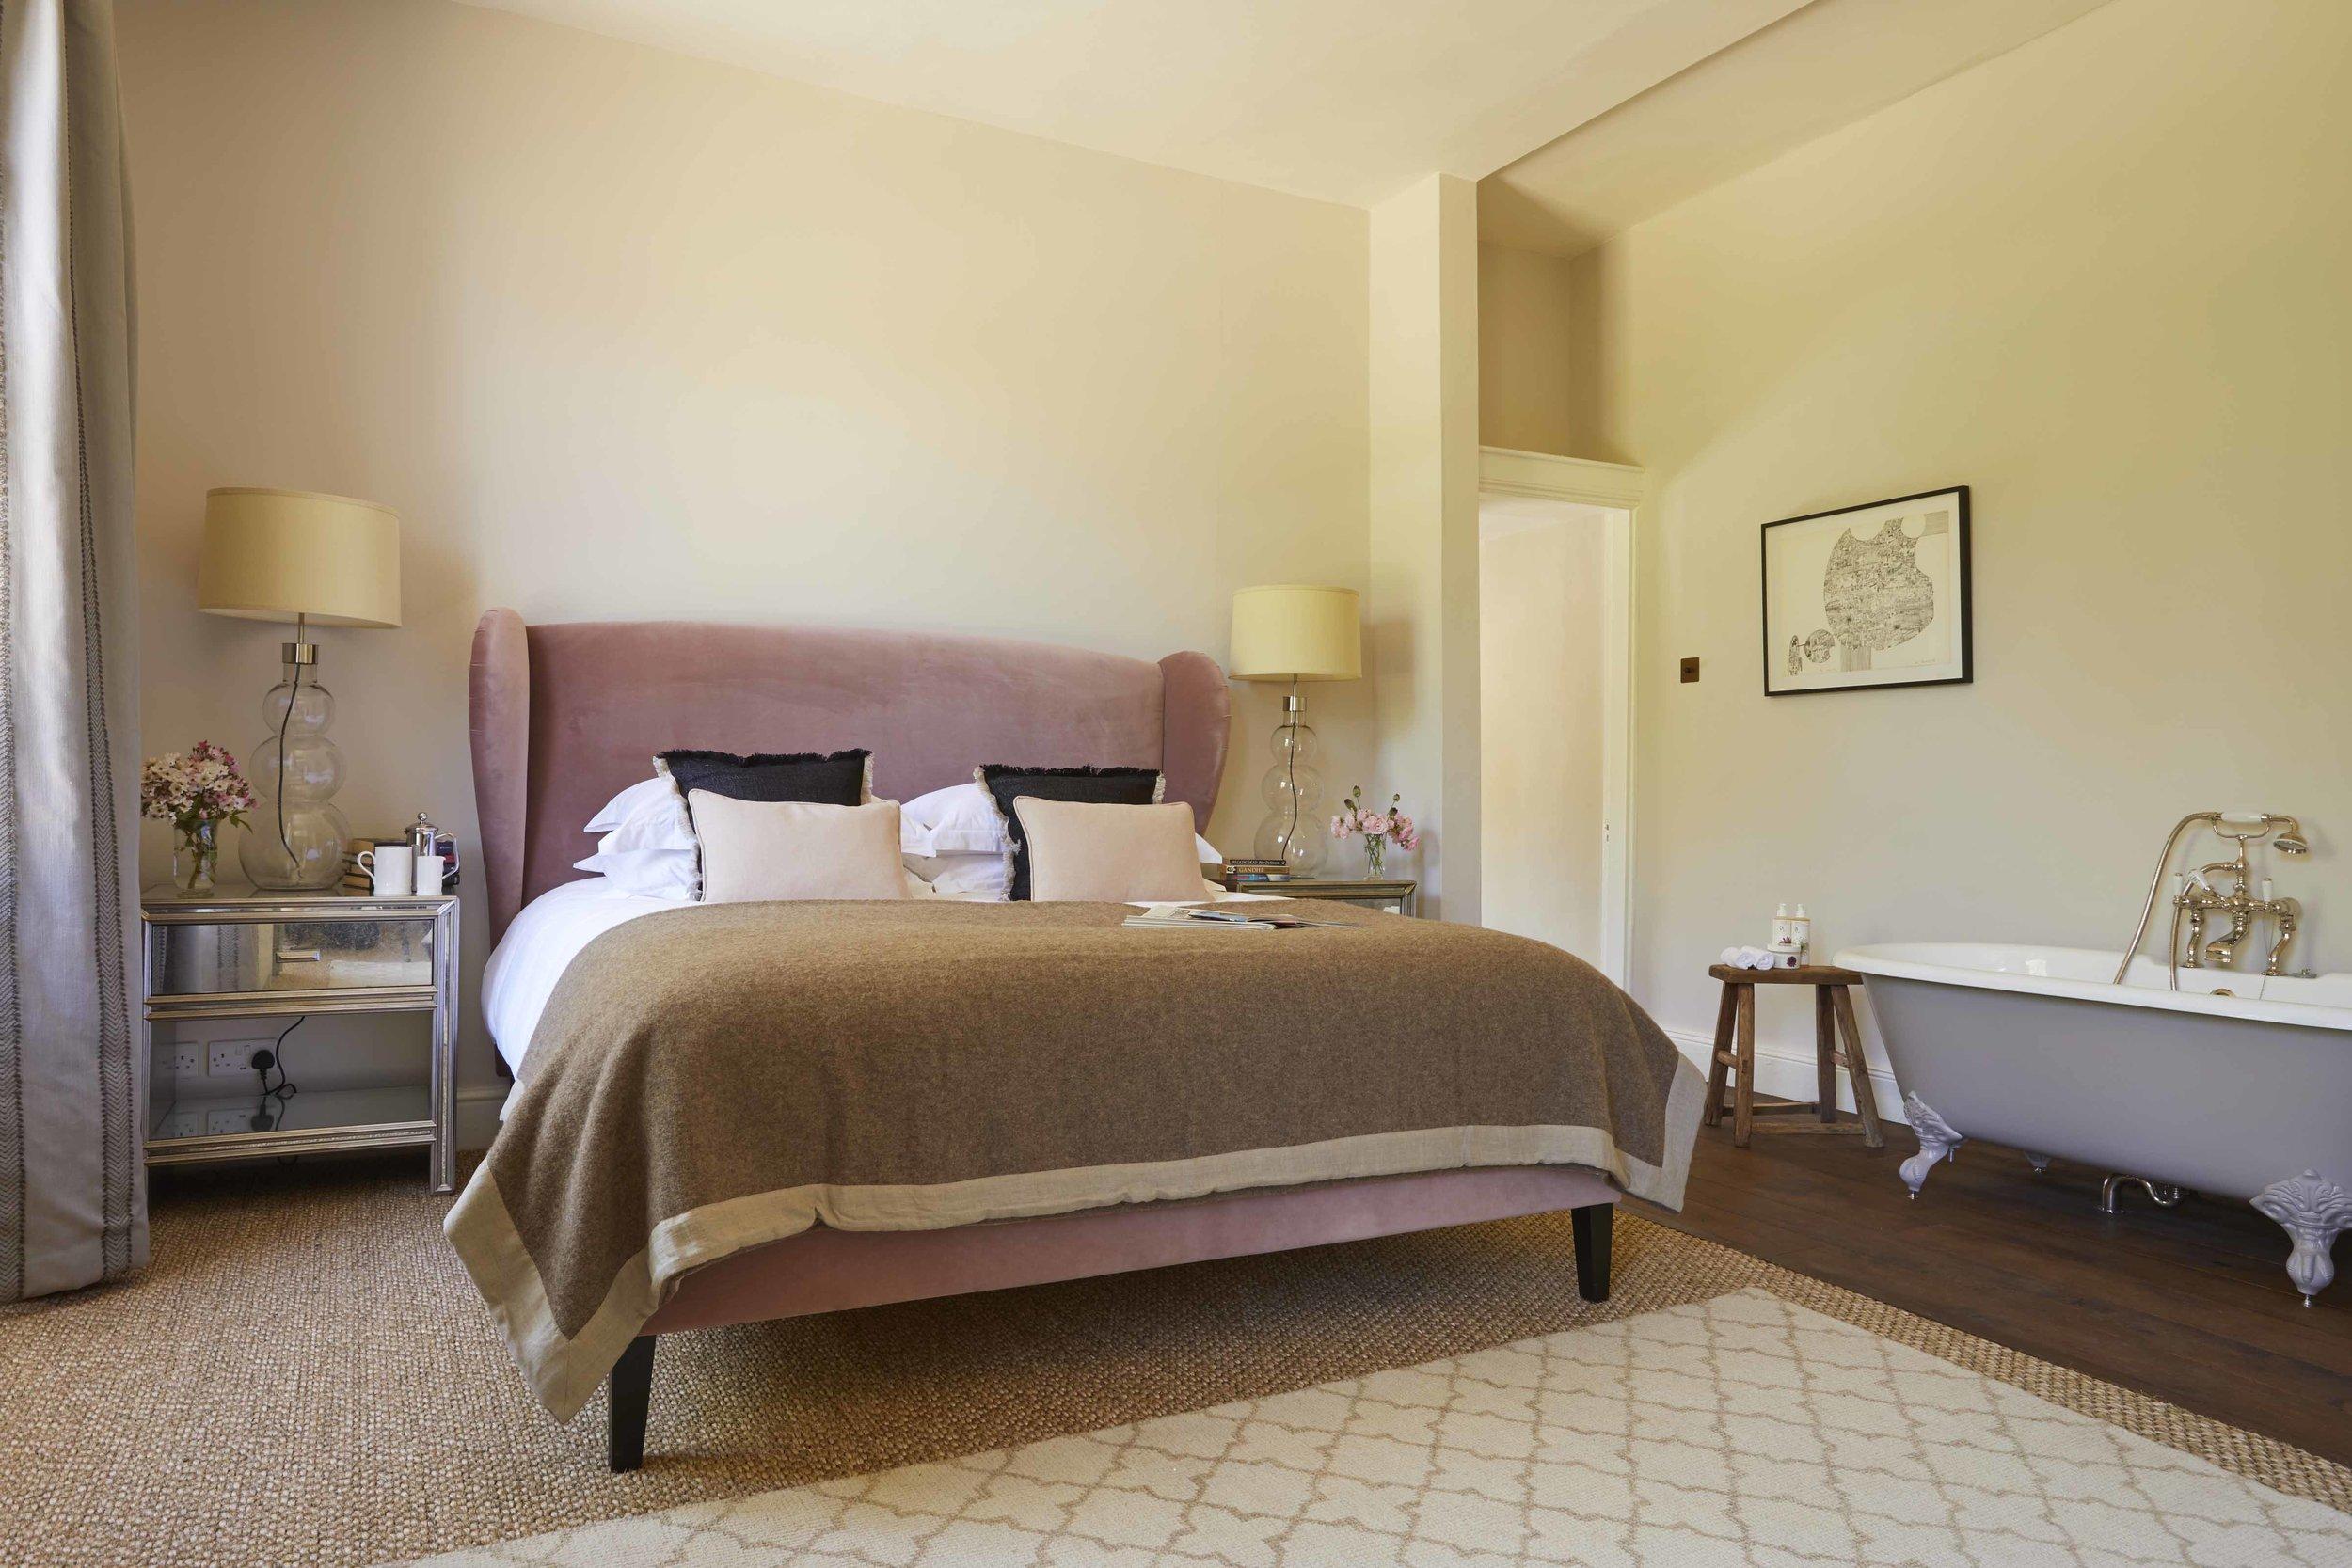 The Rectory Hotel 4- Bedroom3.jpg